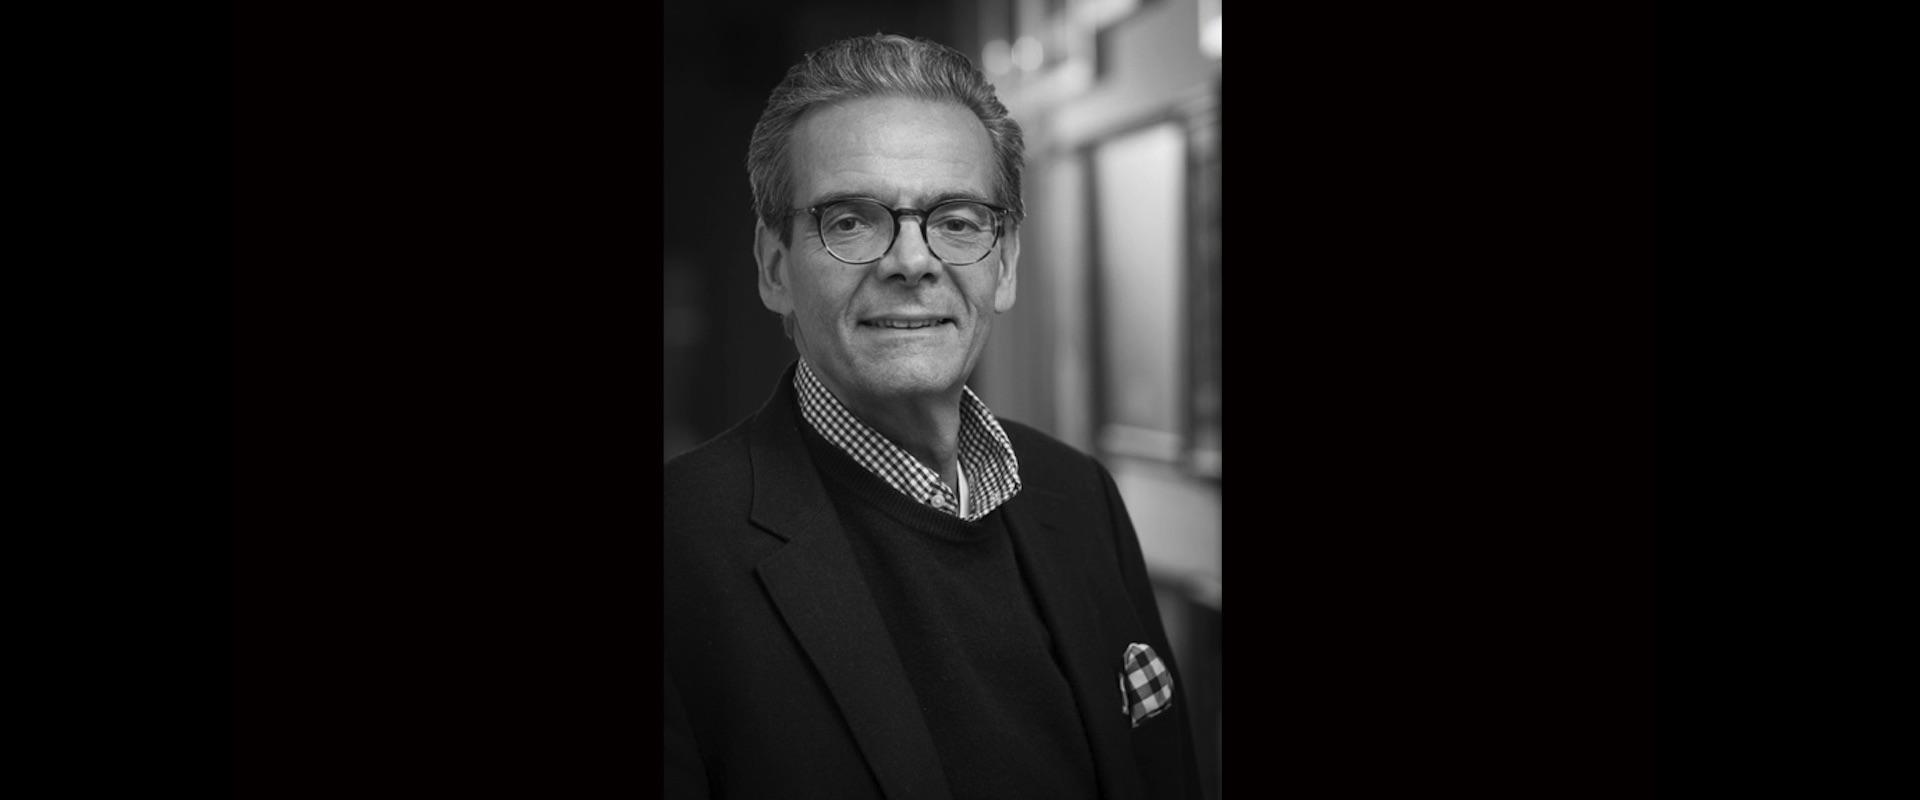 Rolf Budde